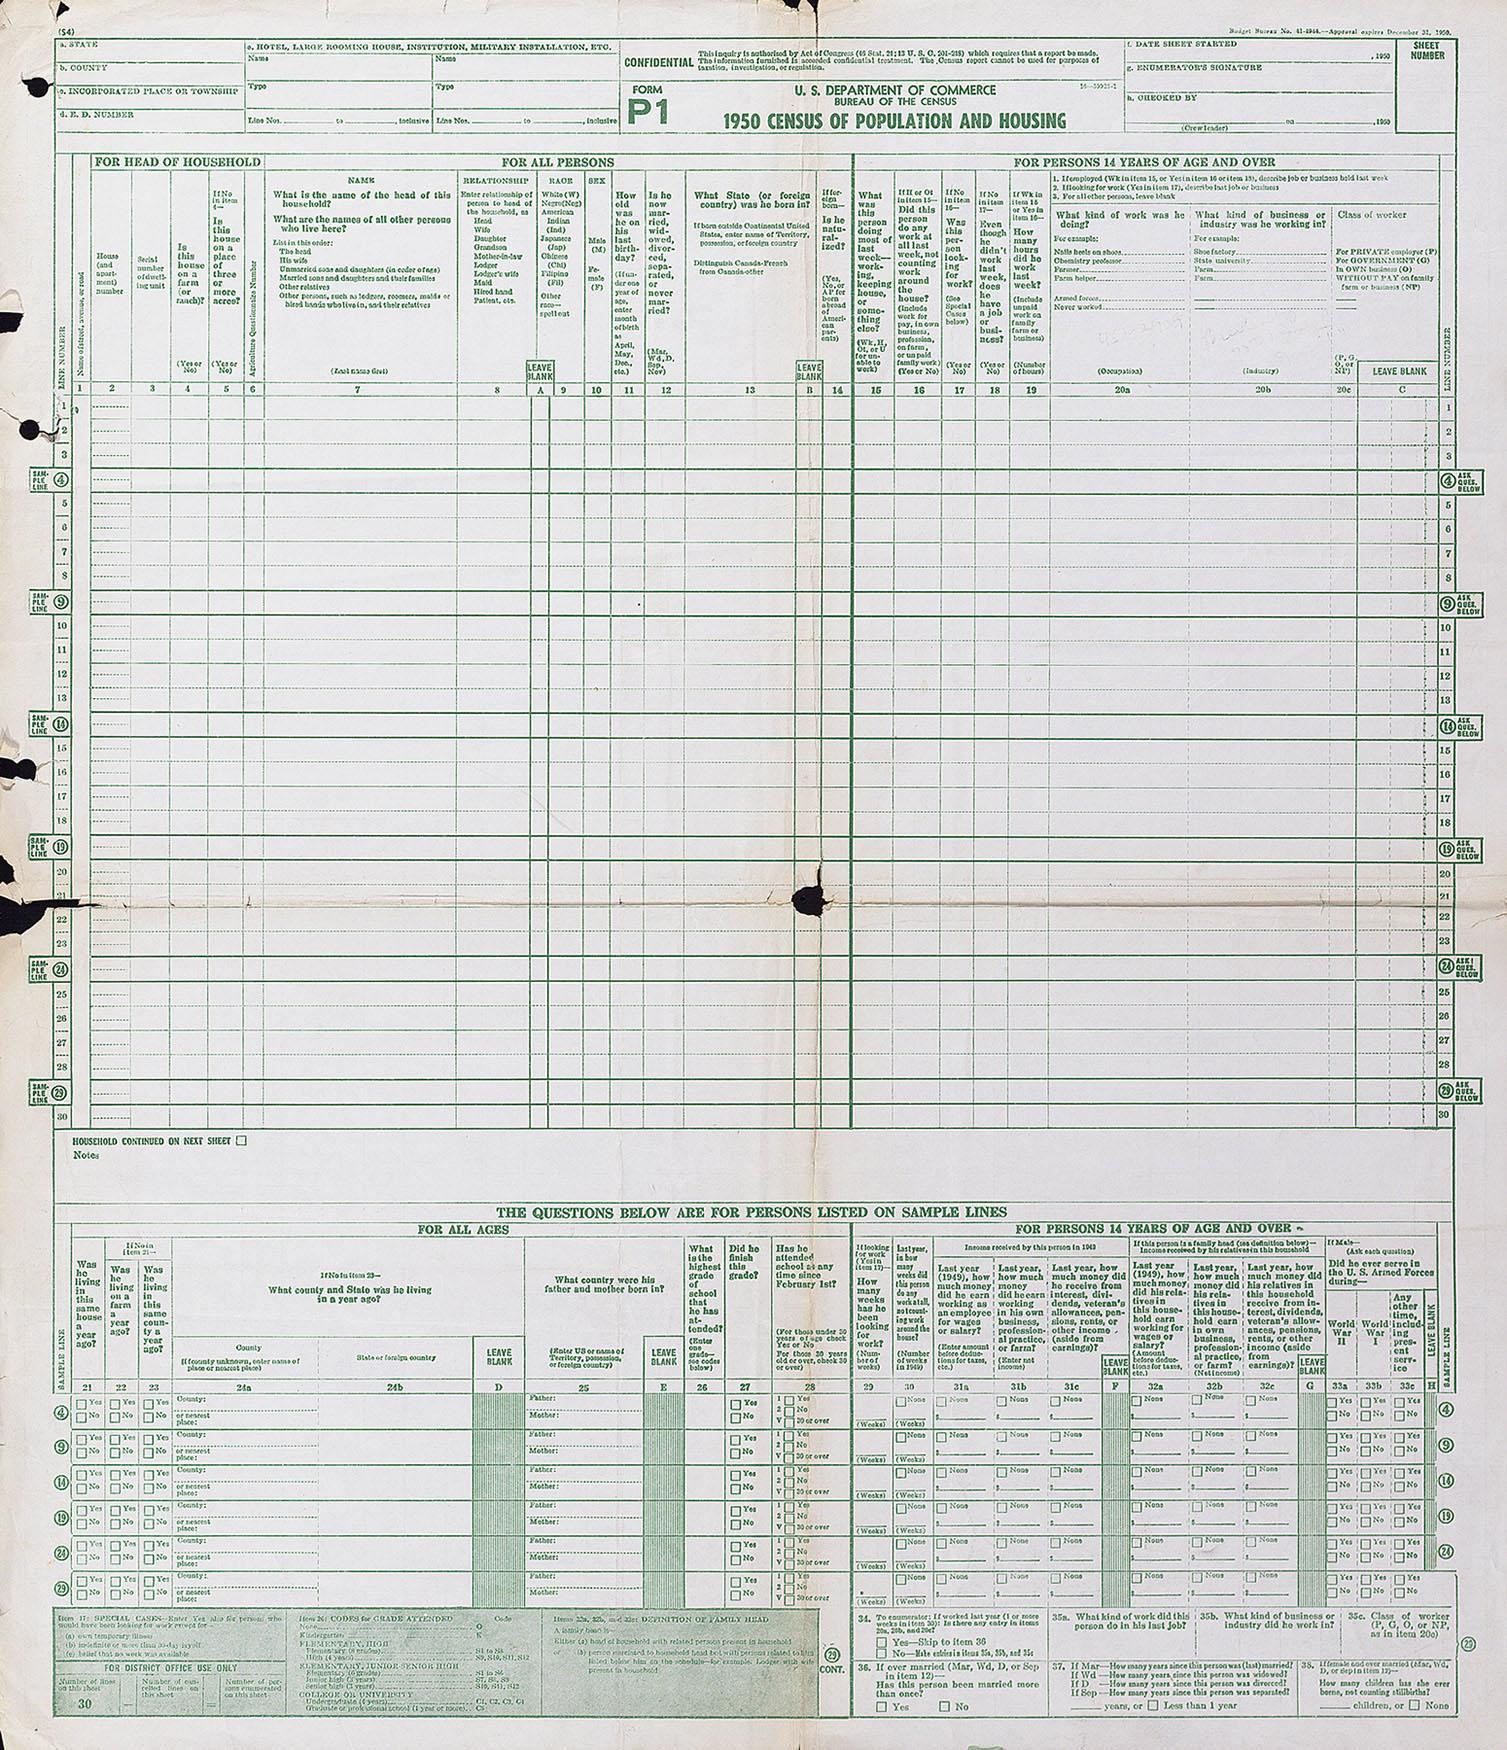 https://broadcast.census.gov/pio/photos/1950/1950a_hi.jpg